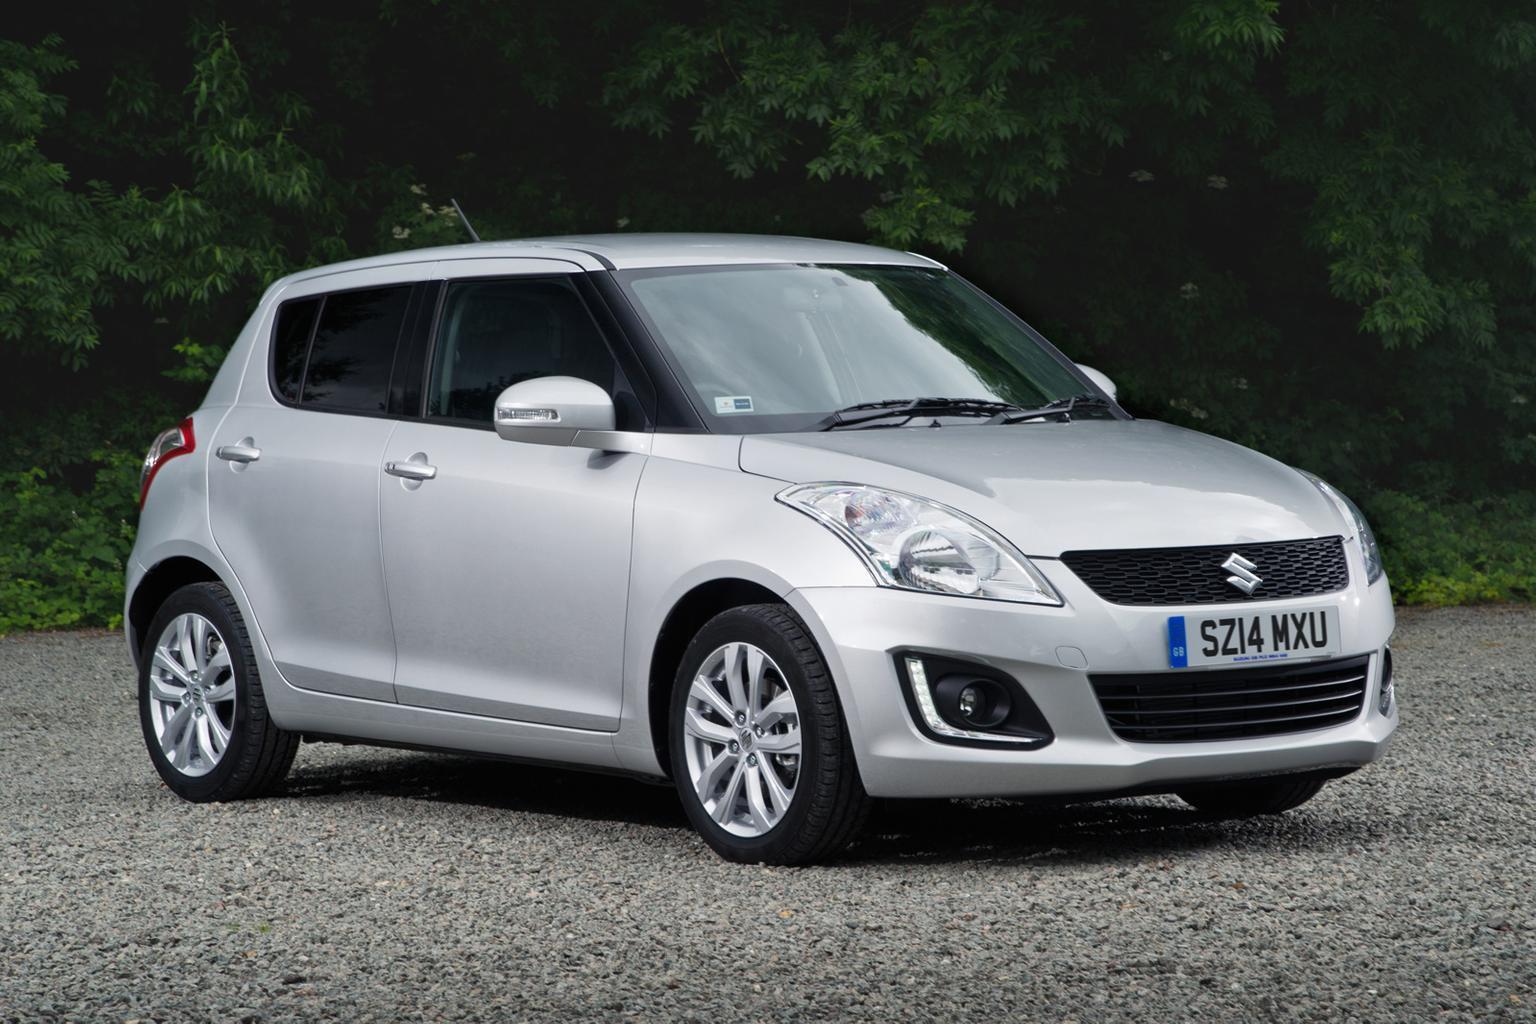 News round-up: Suzuki Swift upgrades, and Renault and Caterham split